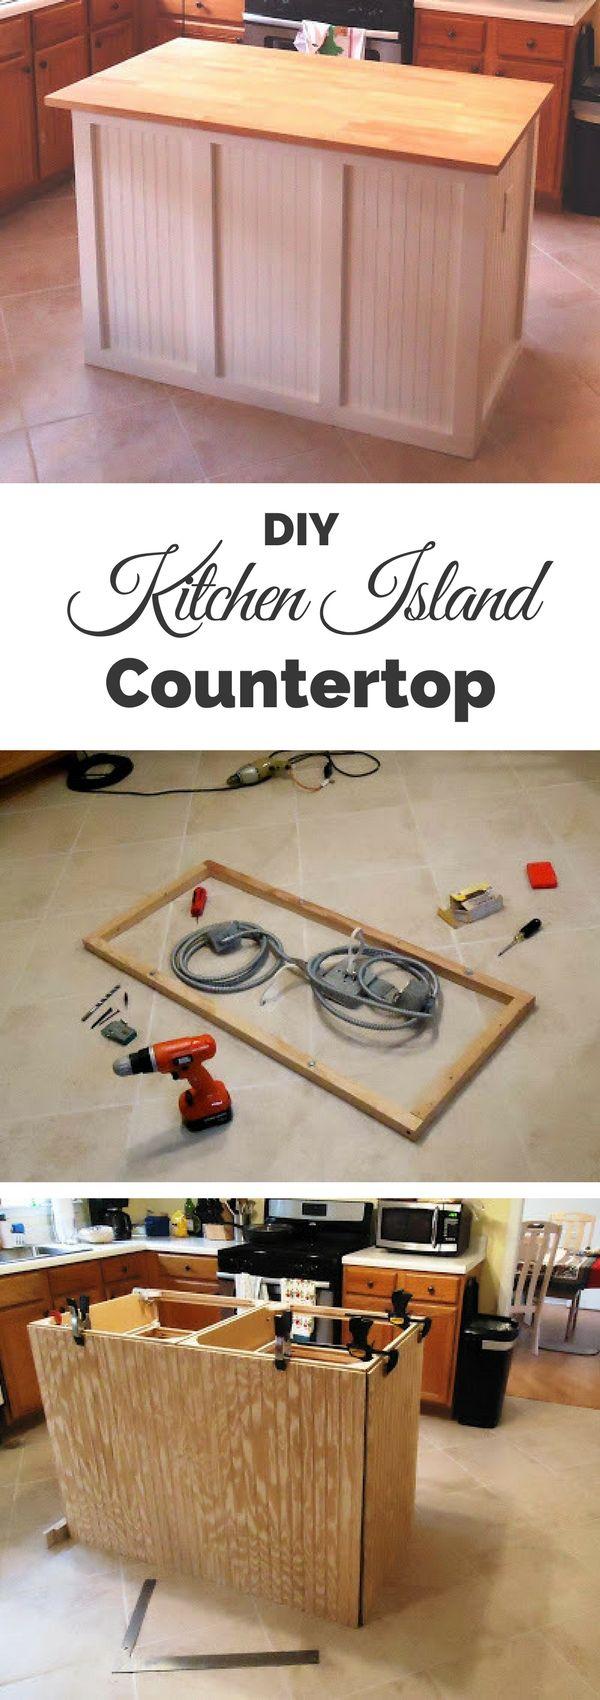 best 25 mobile kitchen island ideas on pinterest kitchen island 15 easy diy kitchen islands that you can build yourself